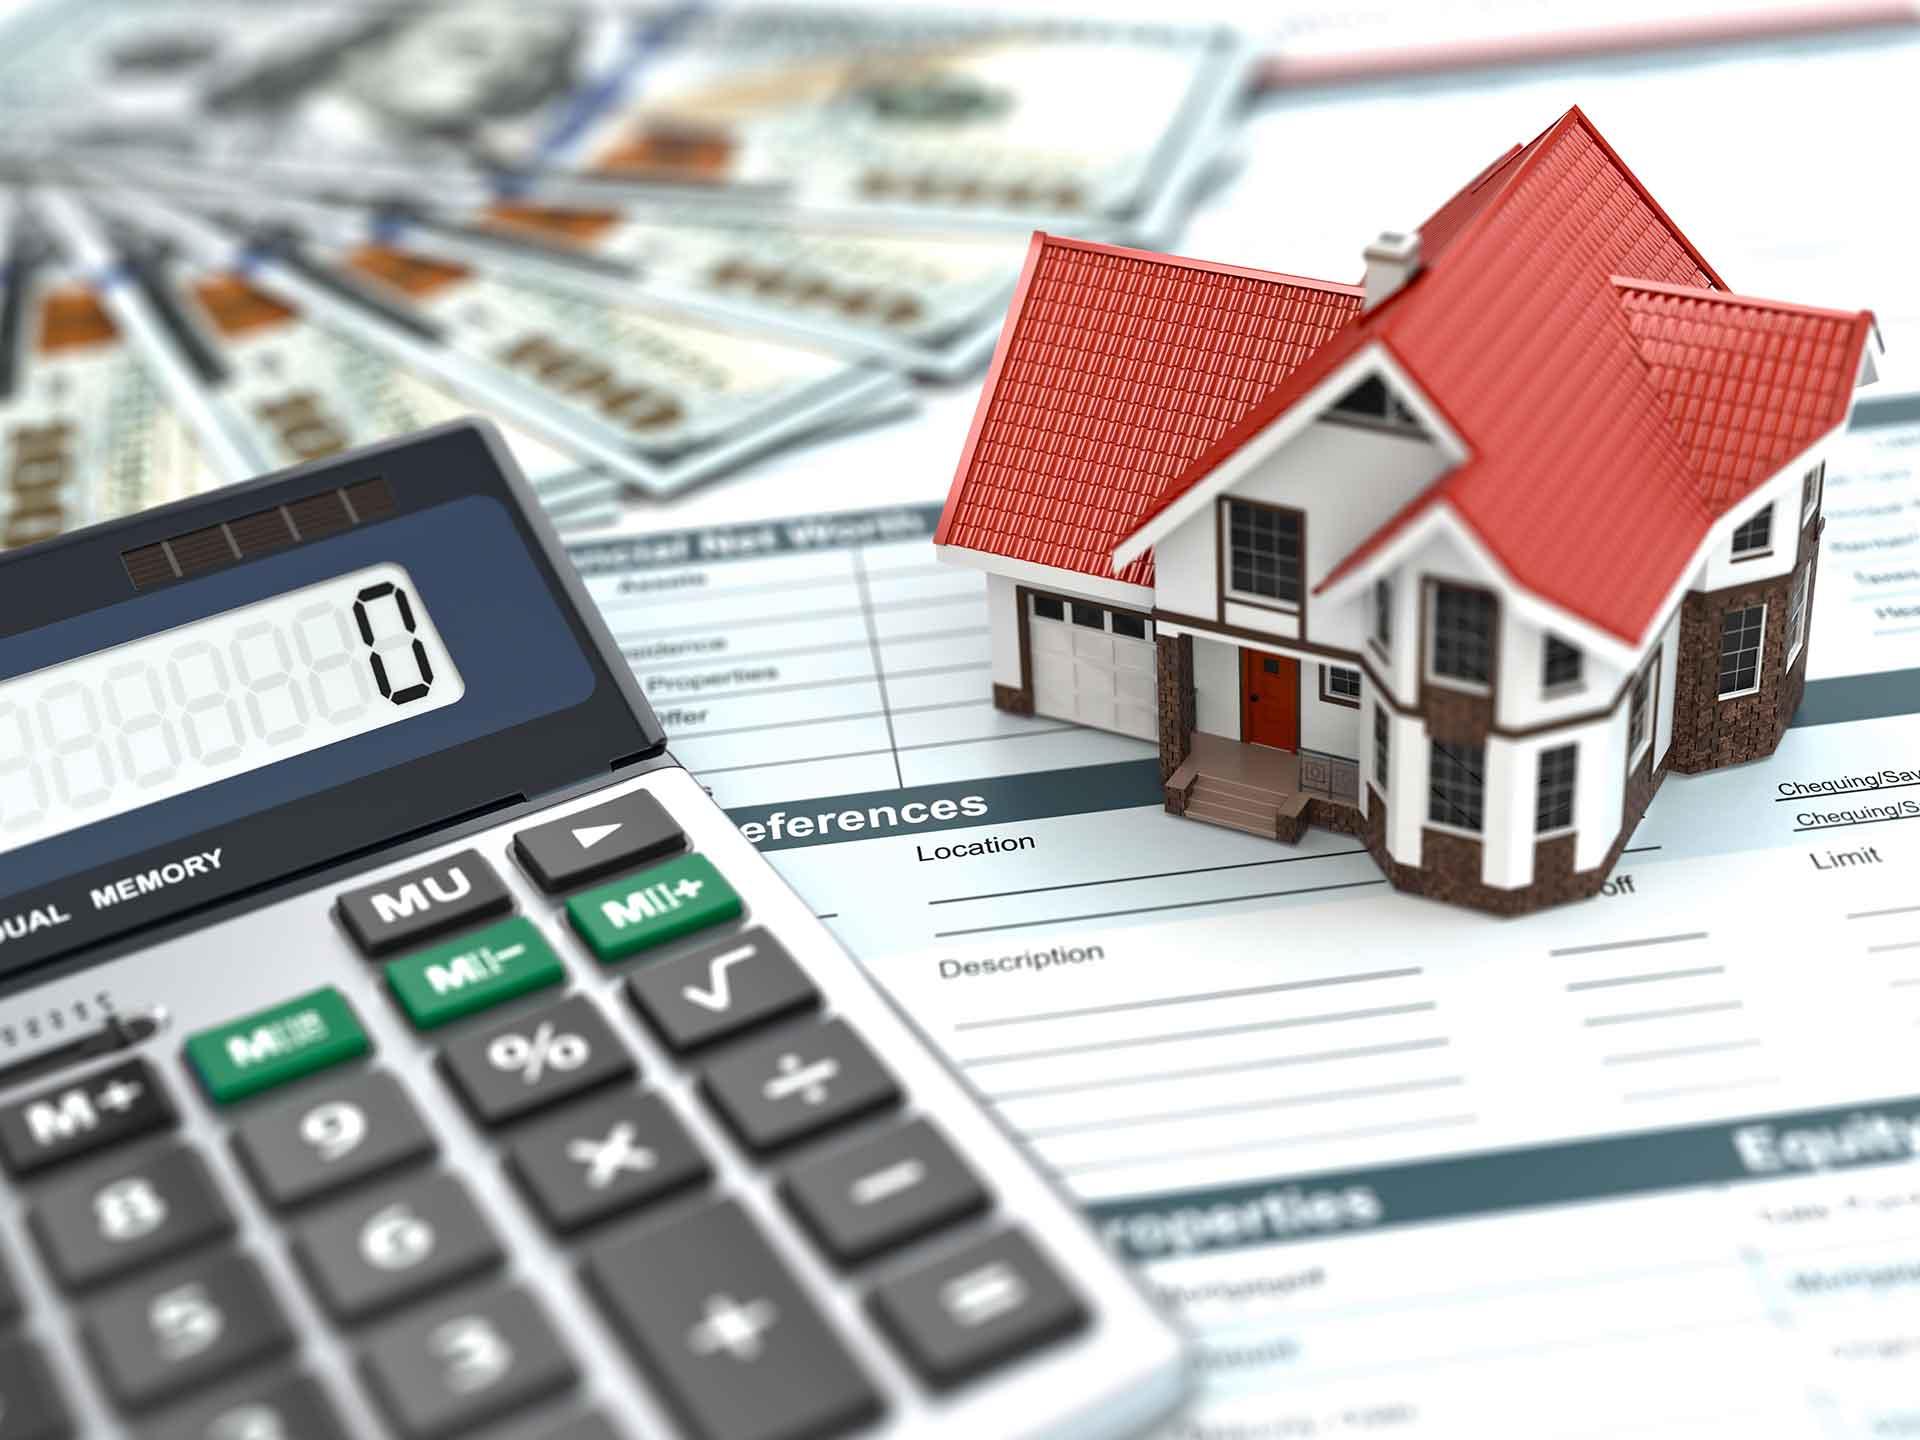 Hypotheekfraude strafrecht advocaat - Weening Strafrechtadvocaten